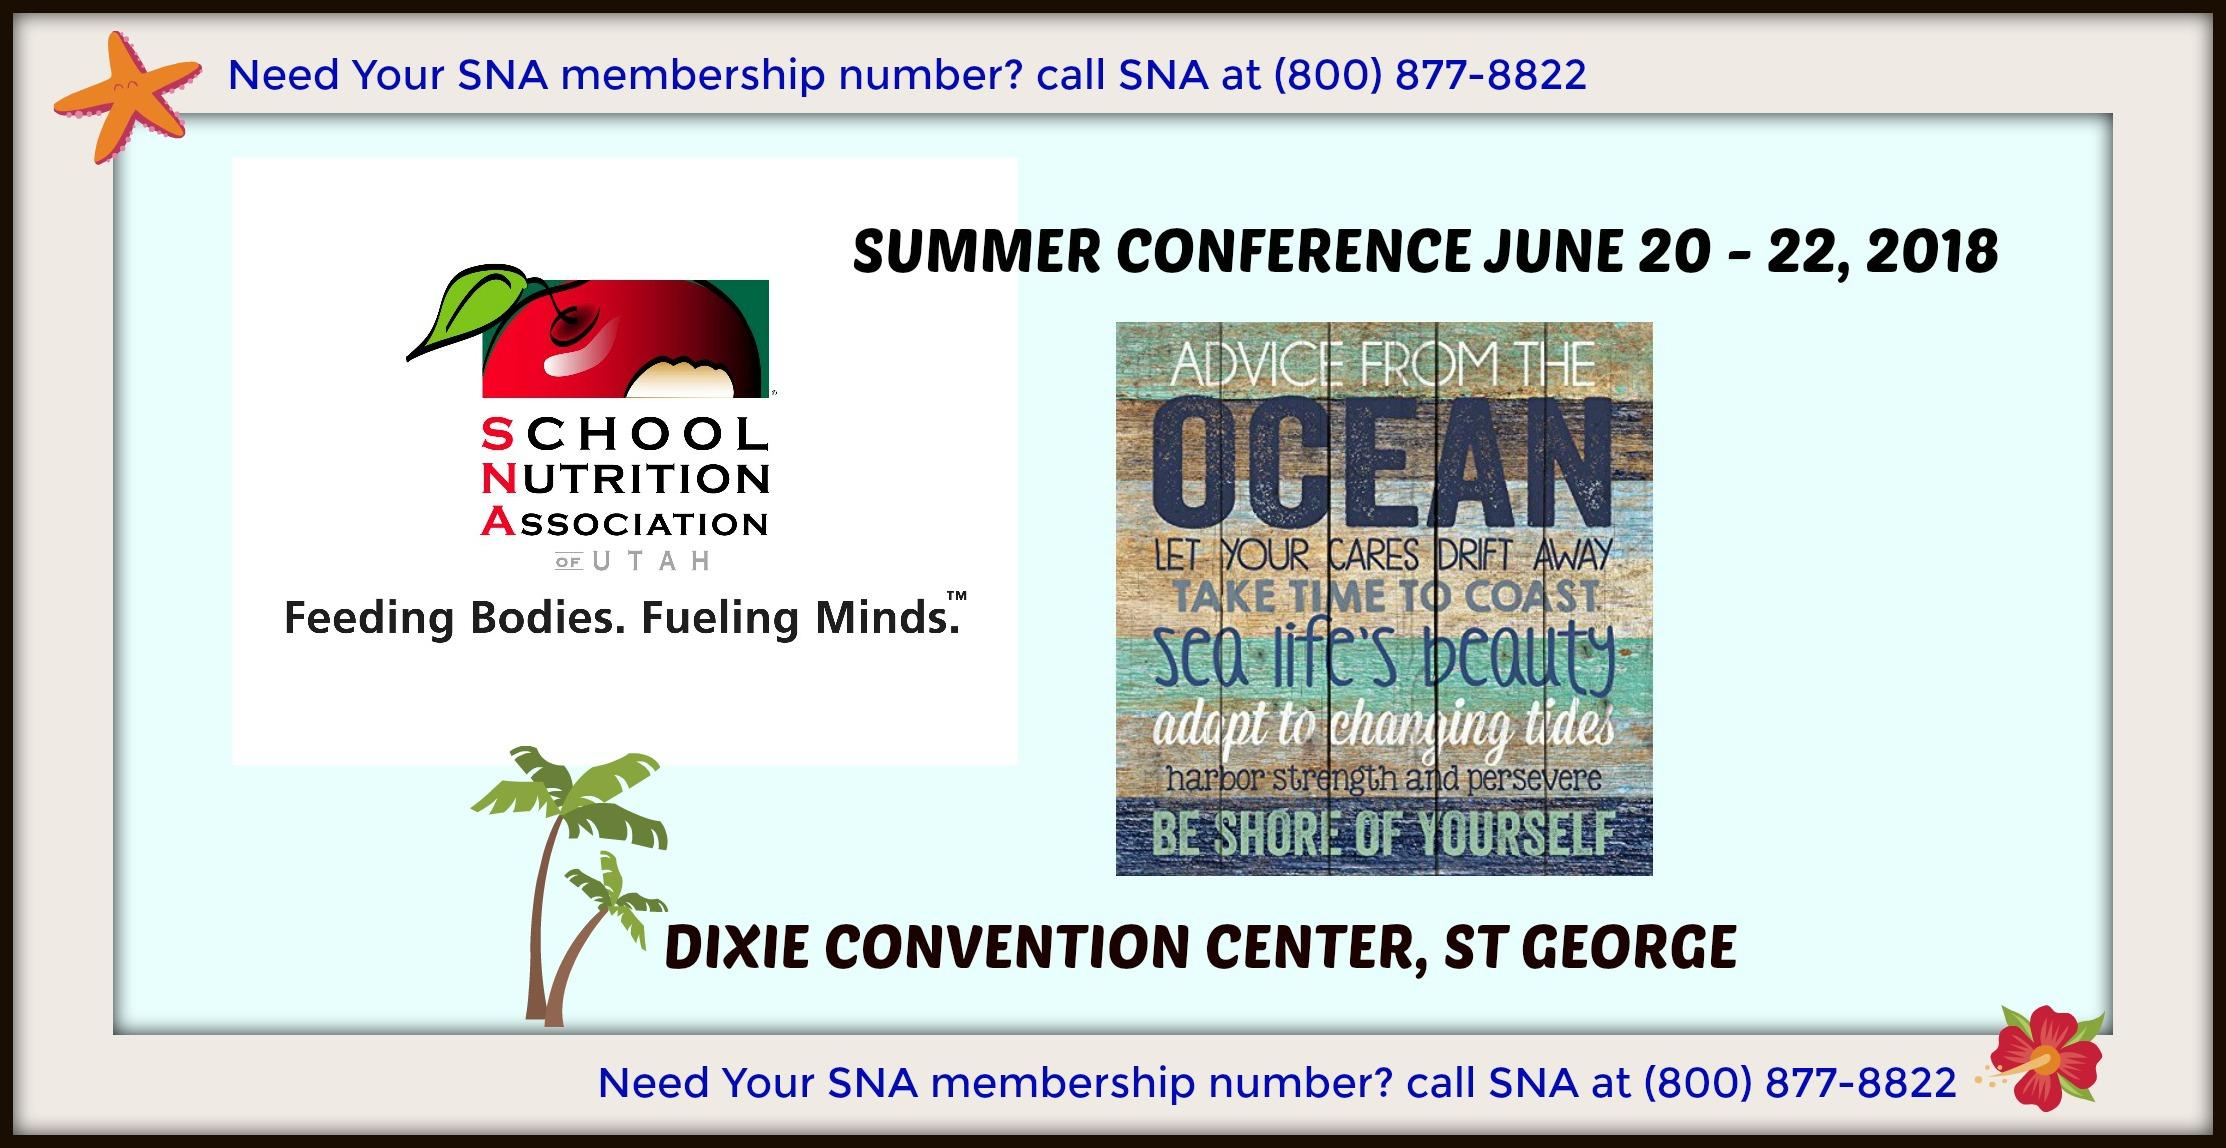 School Nutrition Association of Utah 2018 Summer Conference